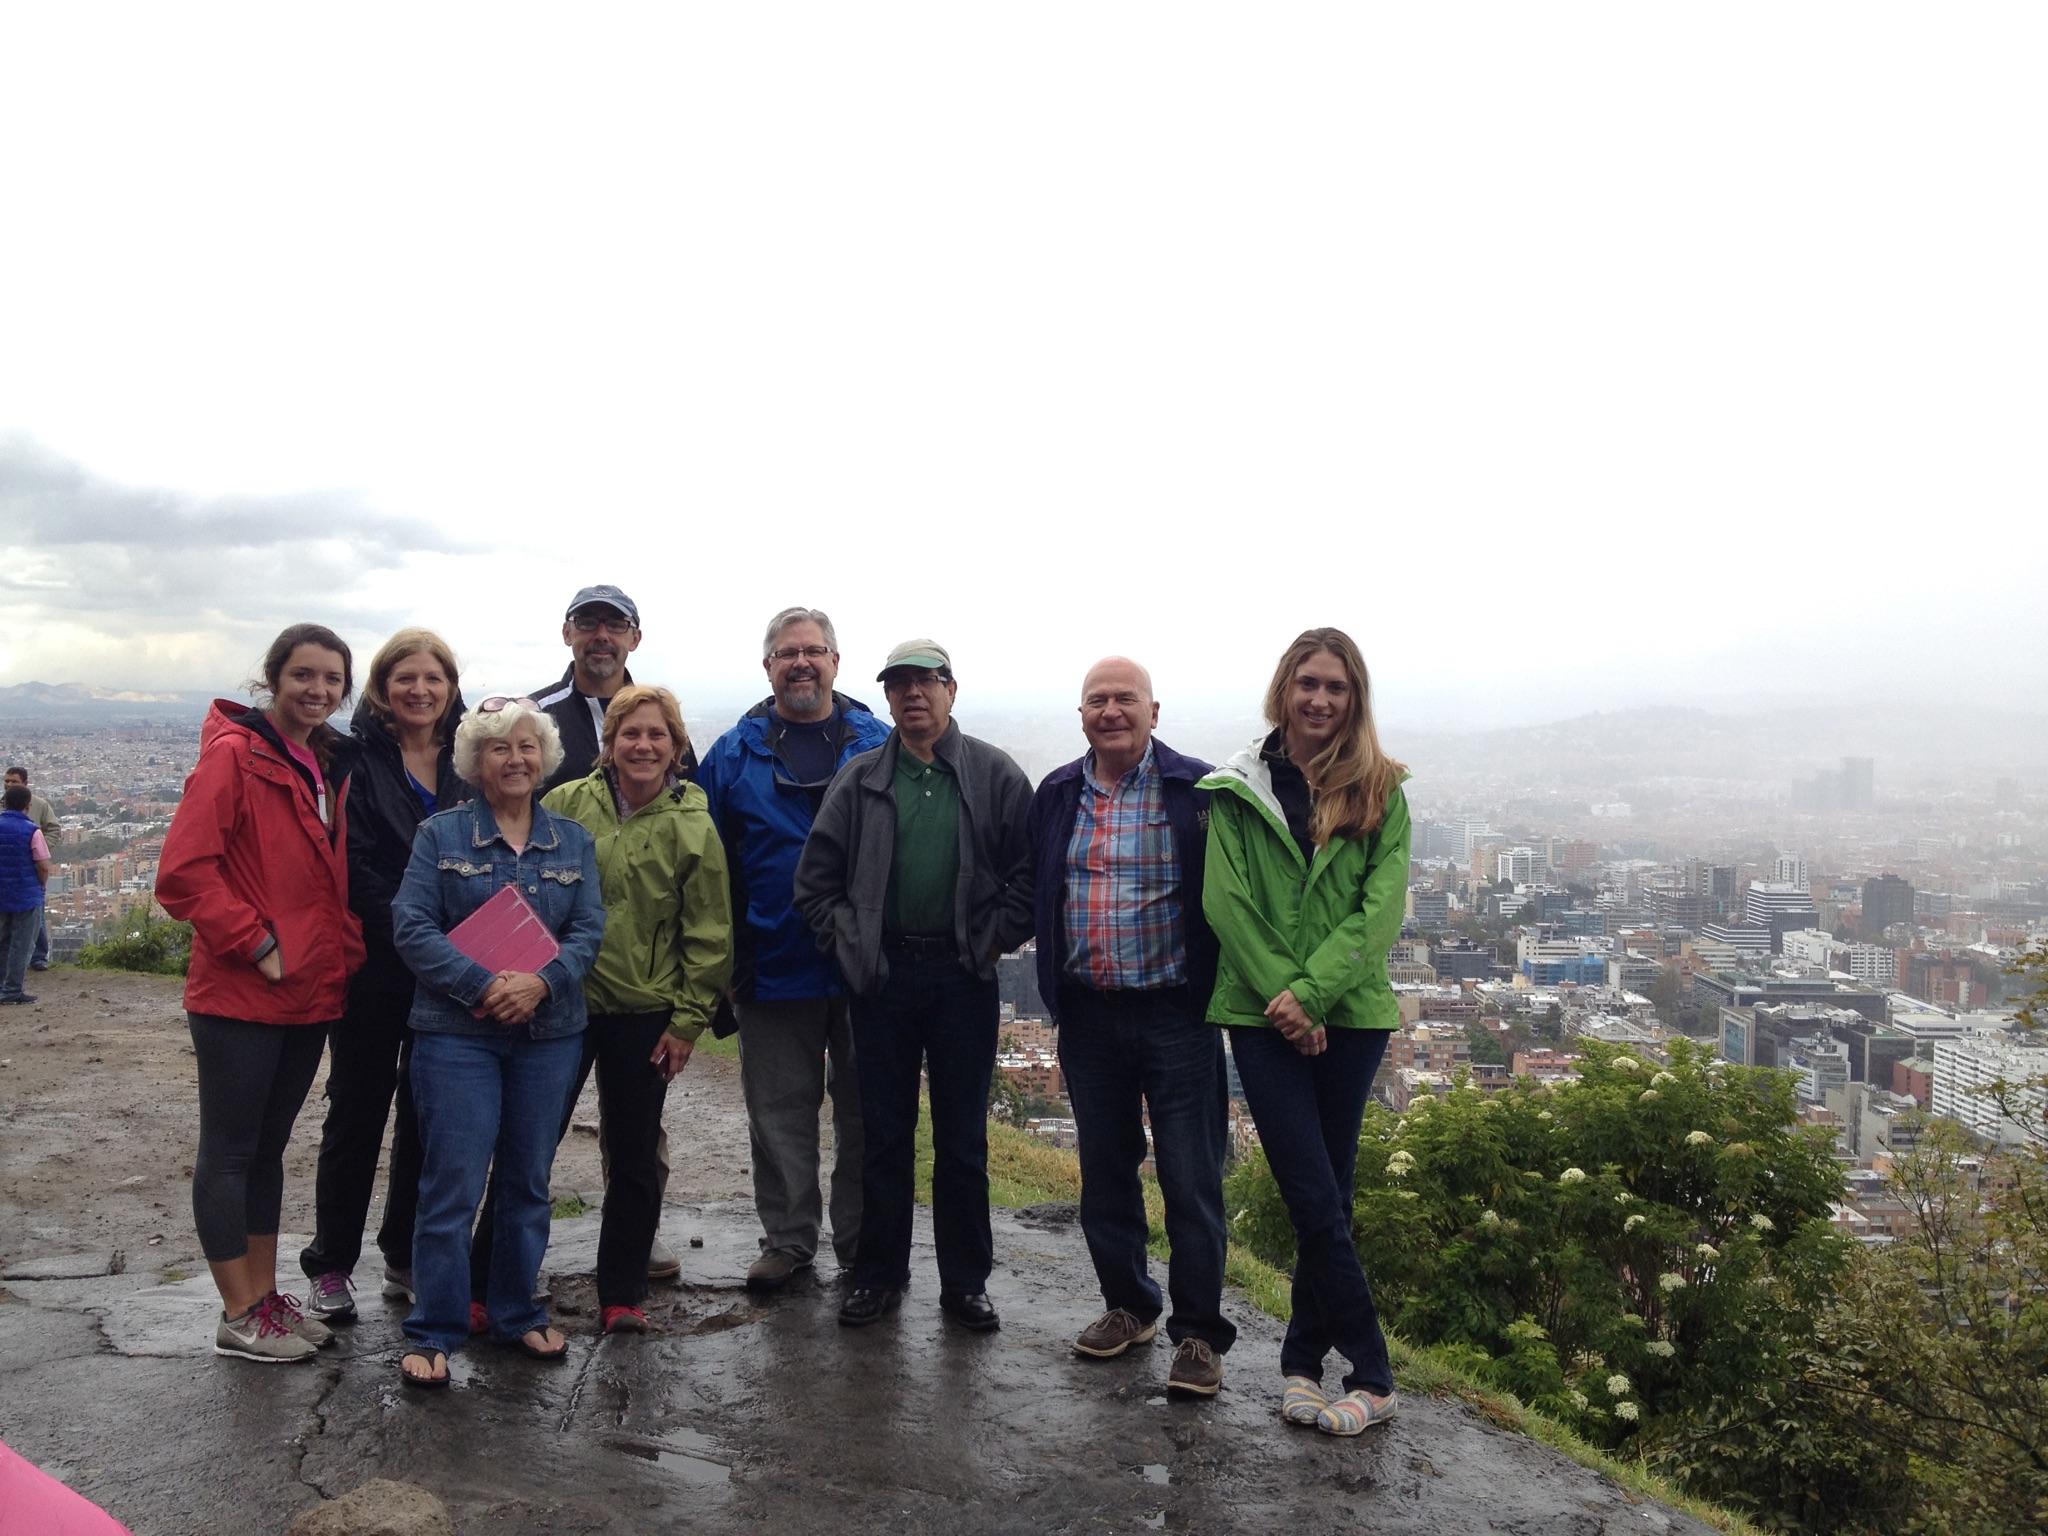 2015 Mission Trip to Bogota, Columbia